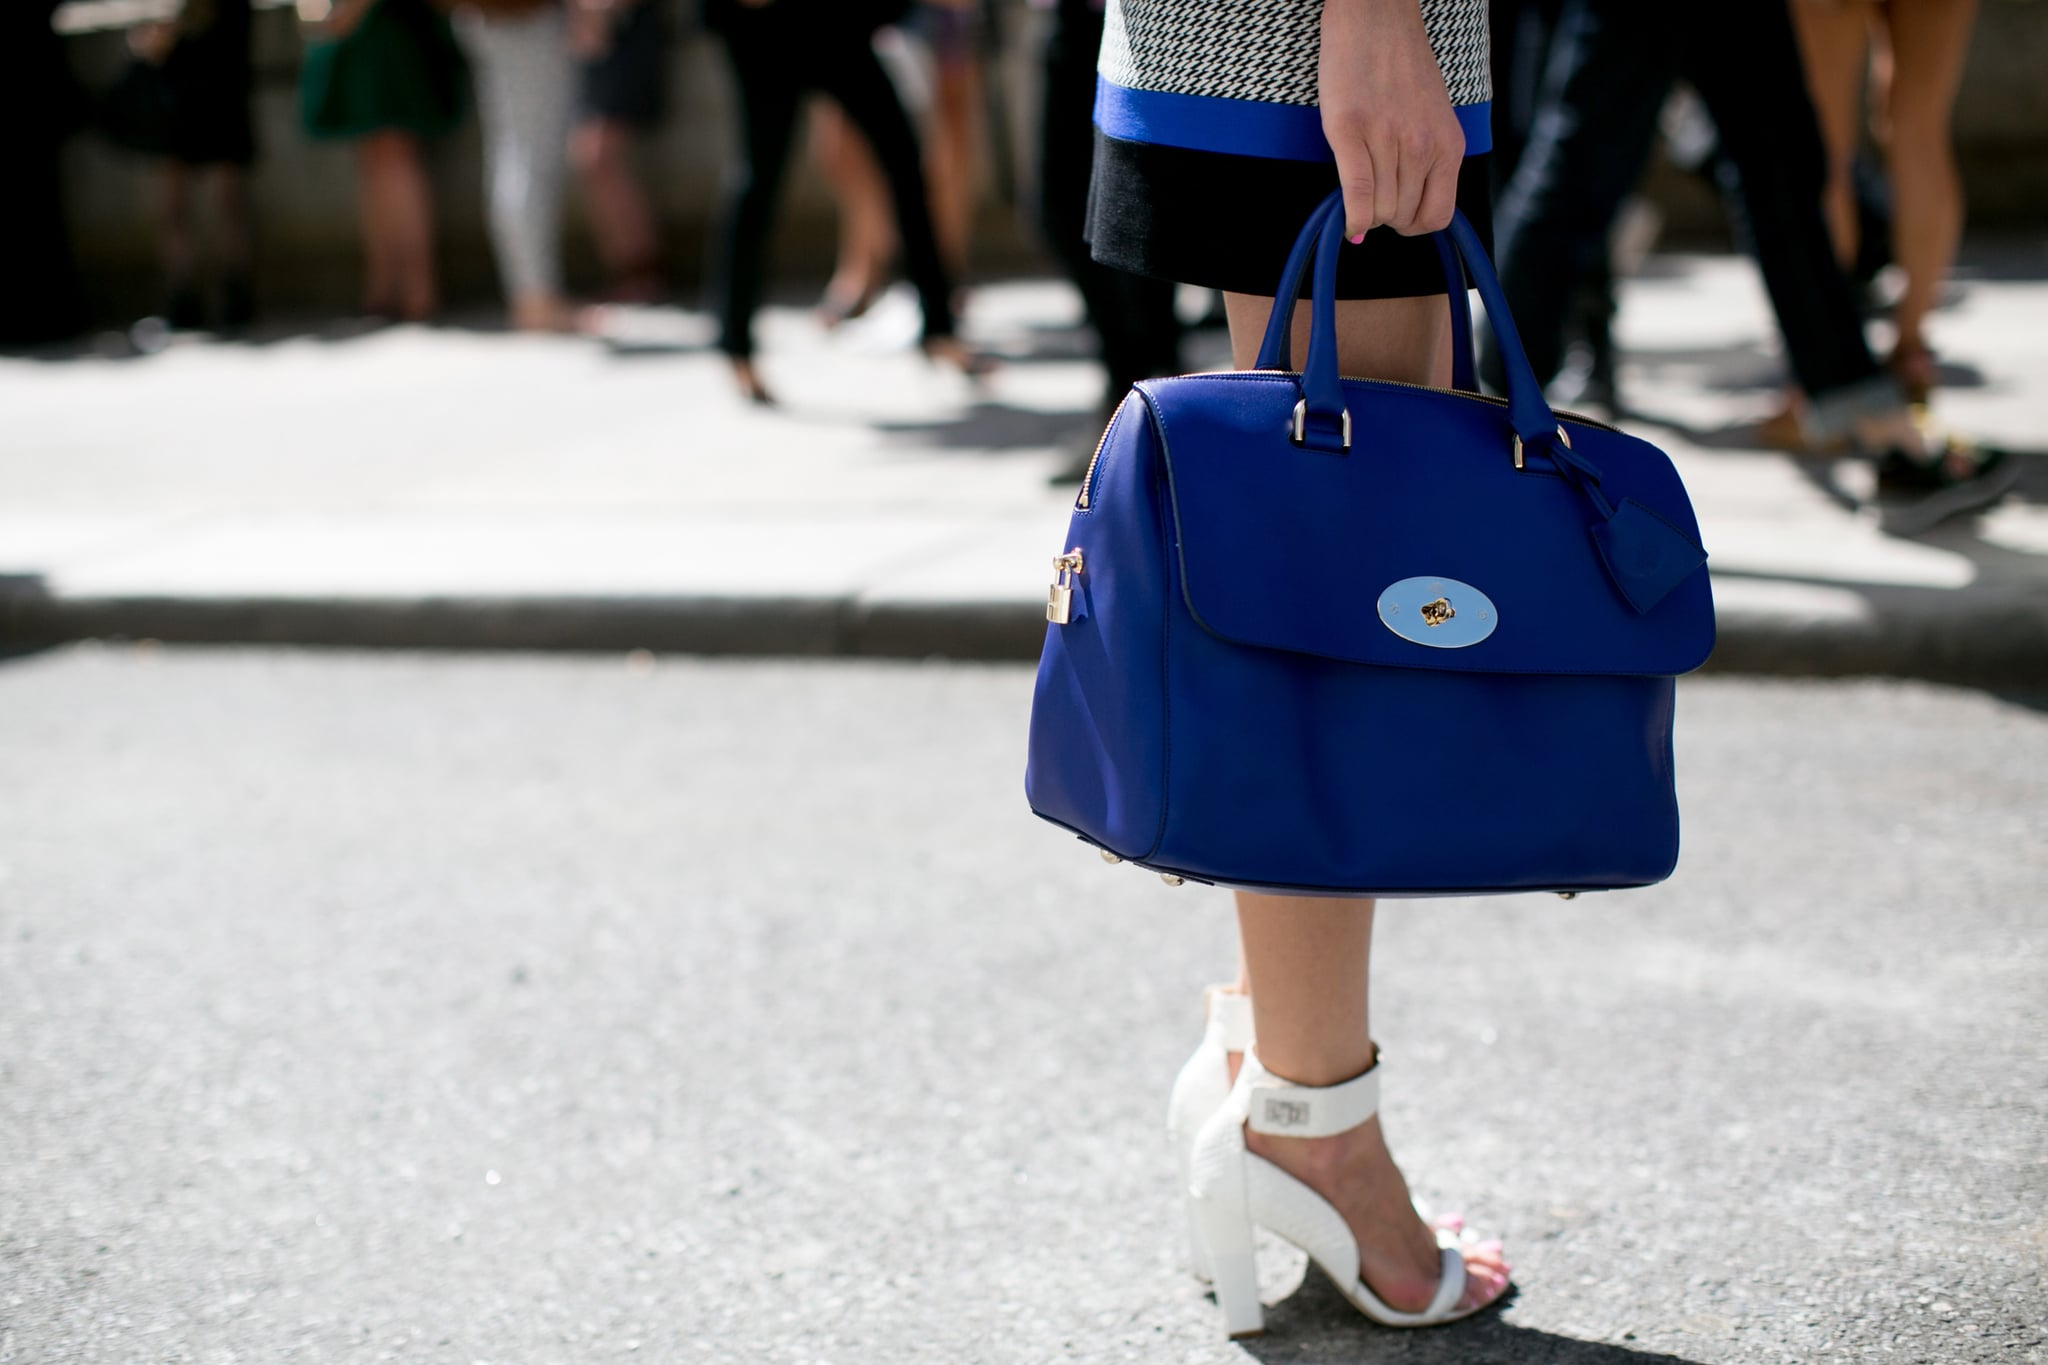 Bold blue on her bag, sleek white on her heels.